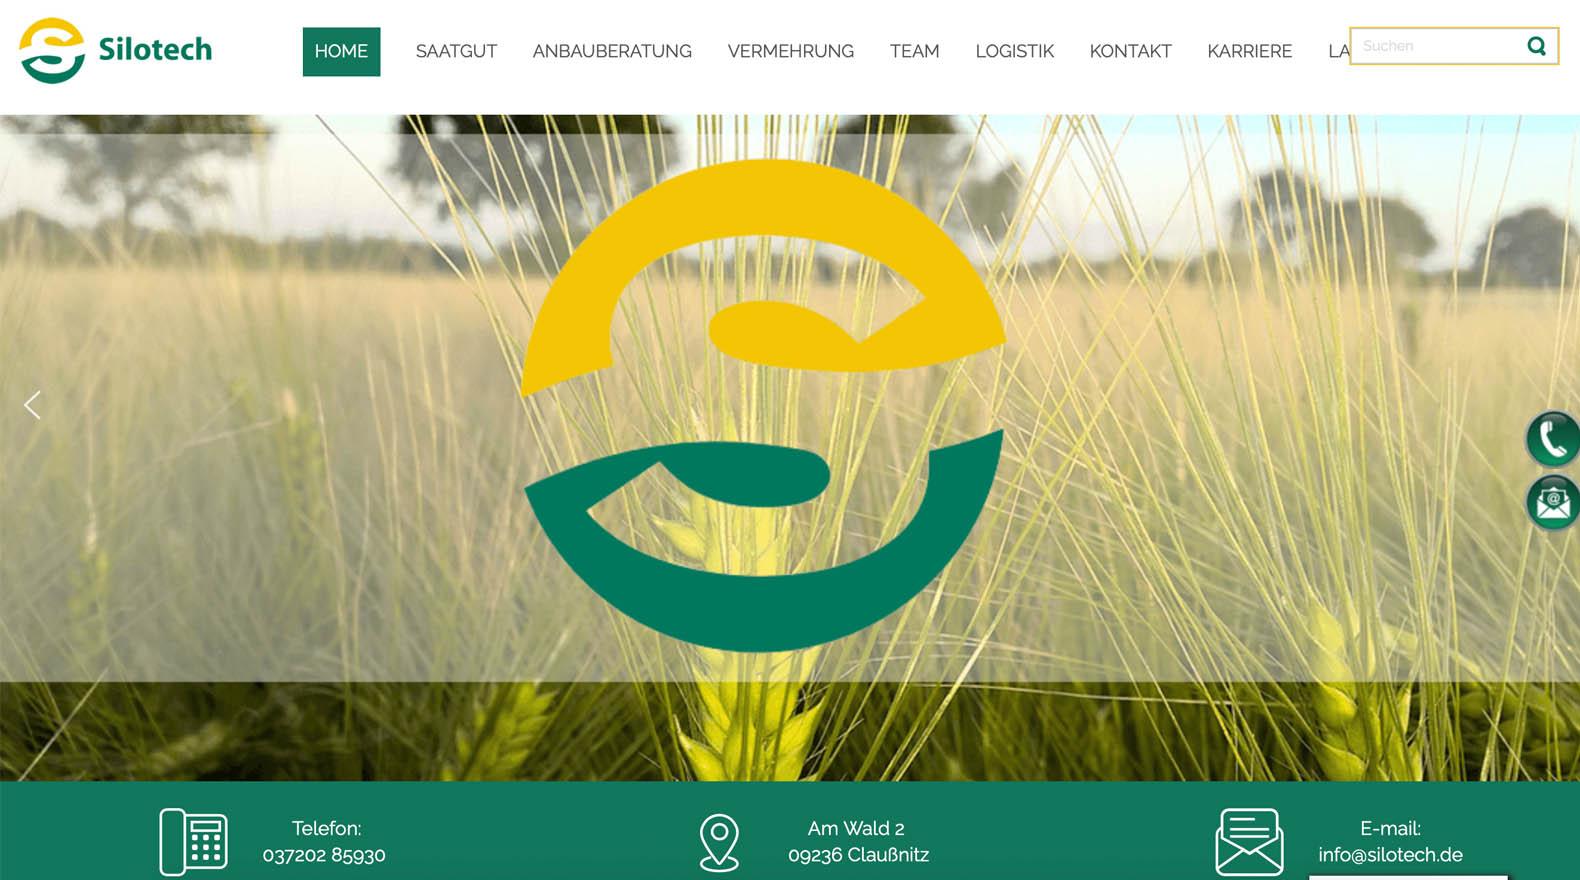 webprojekt-chemnitz-referenz-silotech